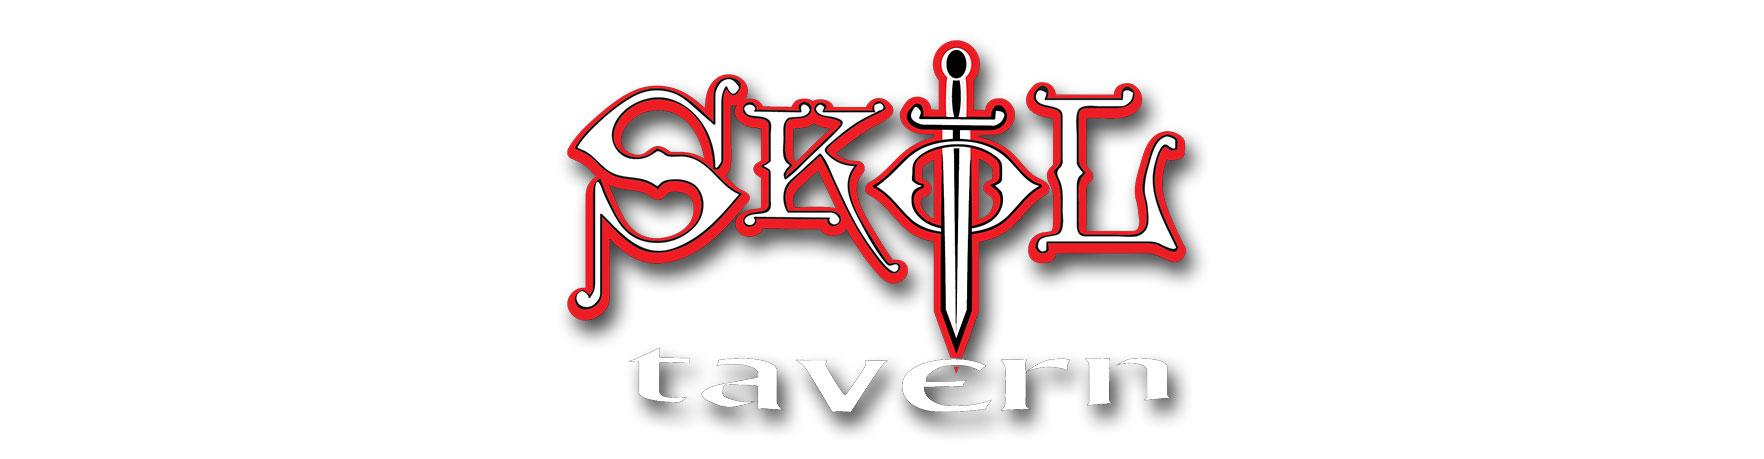 Skol-Tavern-web-logo-wide.jpg